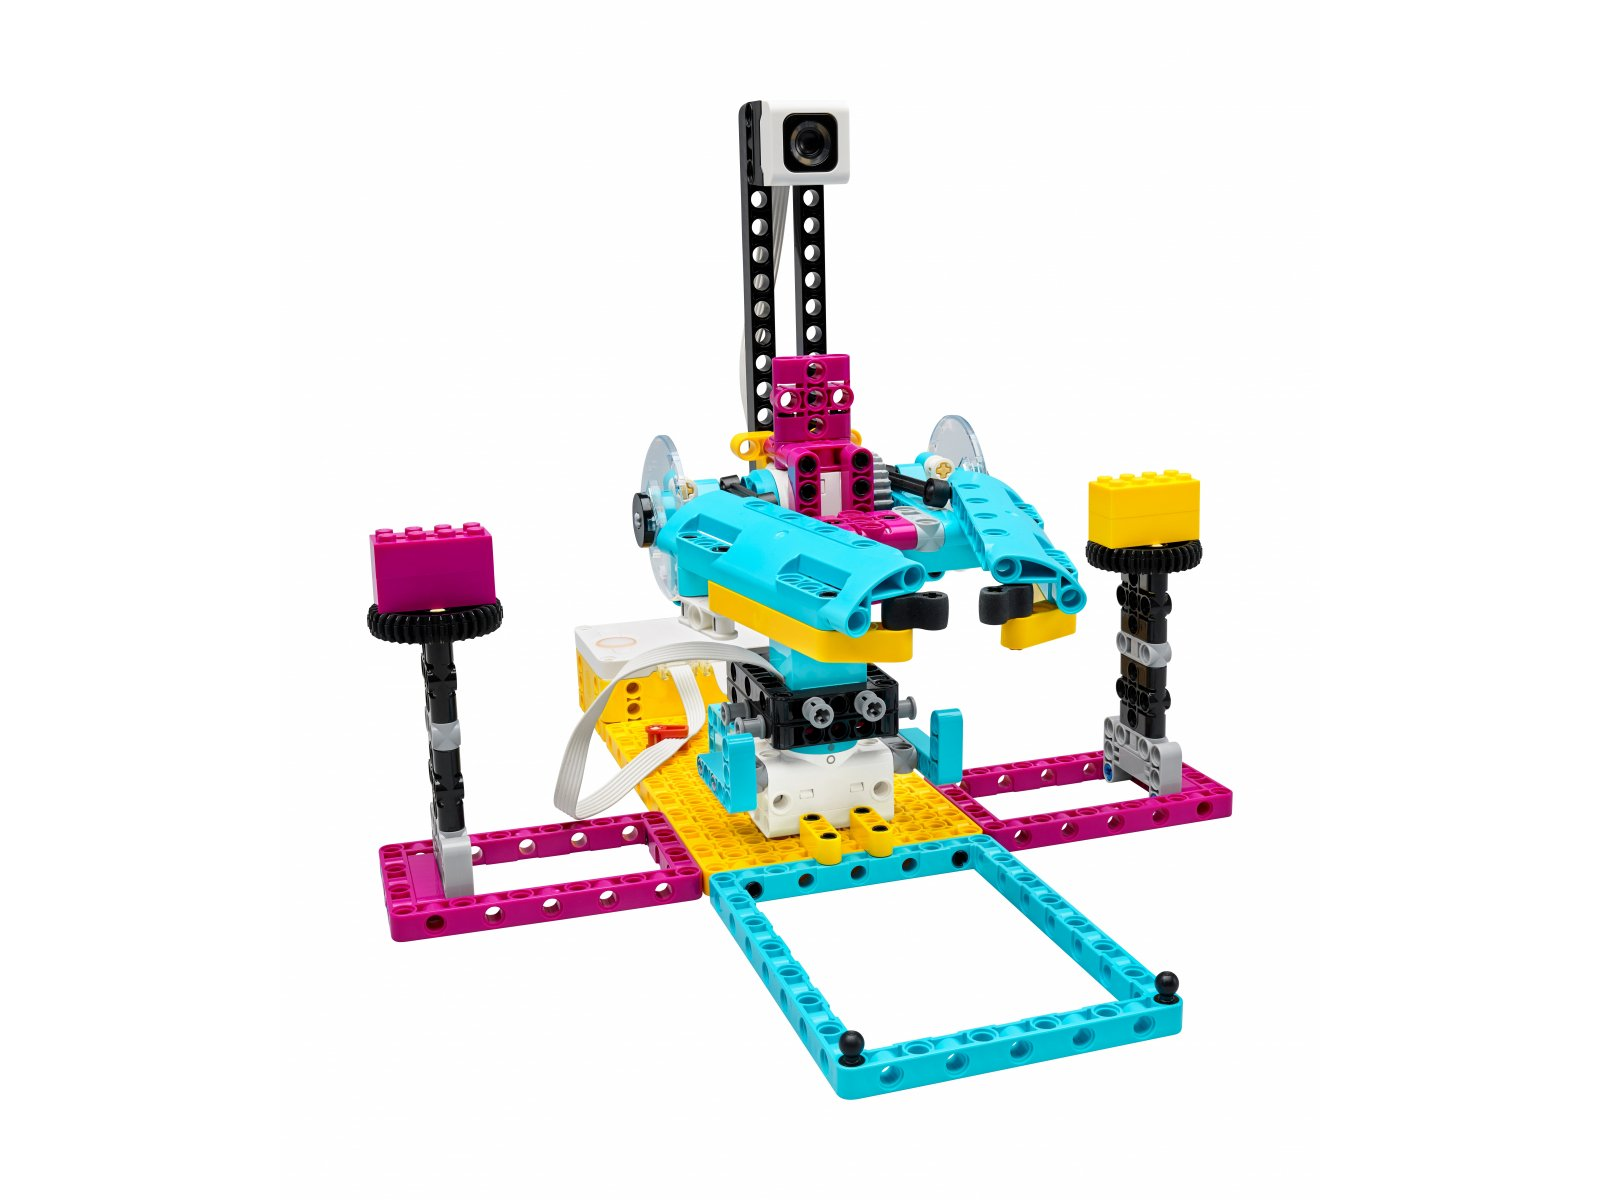 LEGO 45678 SPIKE™ Prime